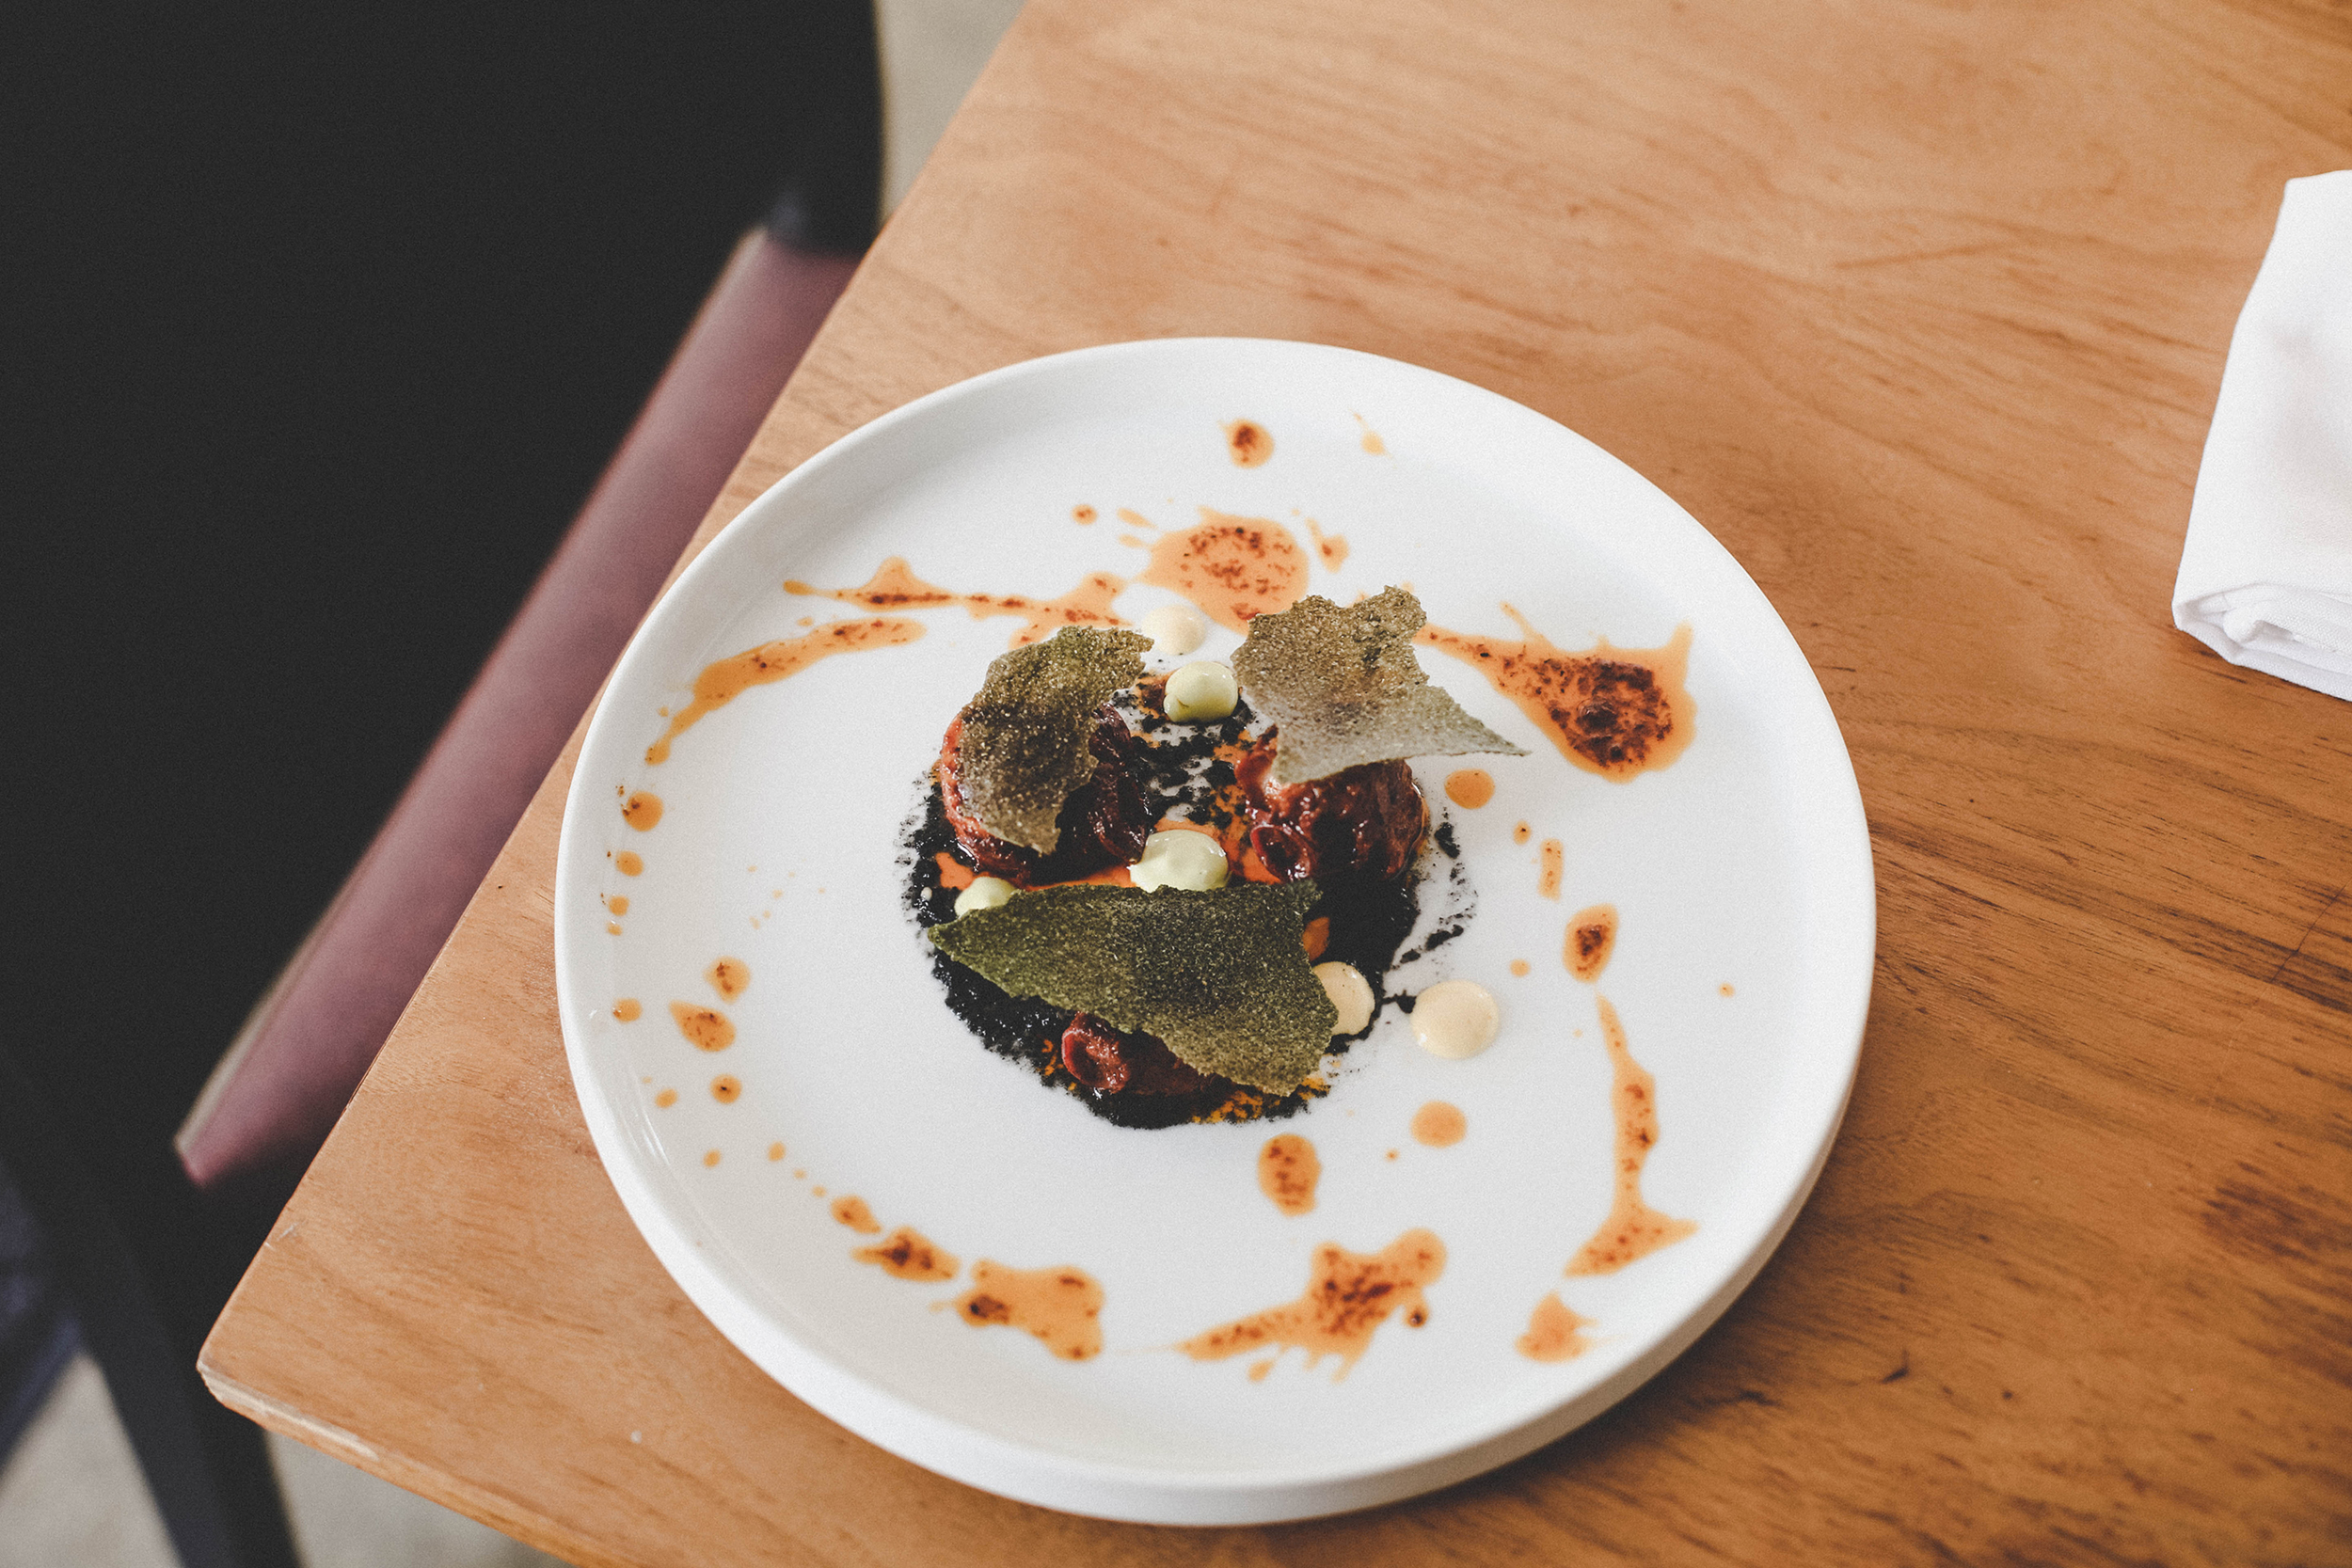 Chorizo octopus with burnt onion pure, chilli sauce, and cassava crackers.